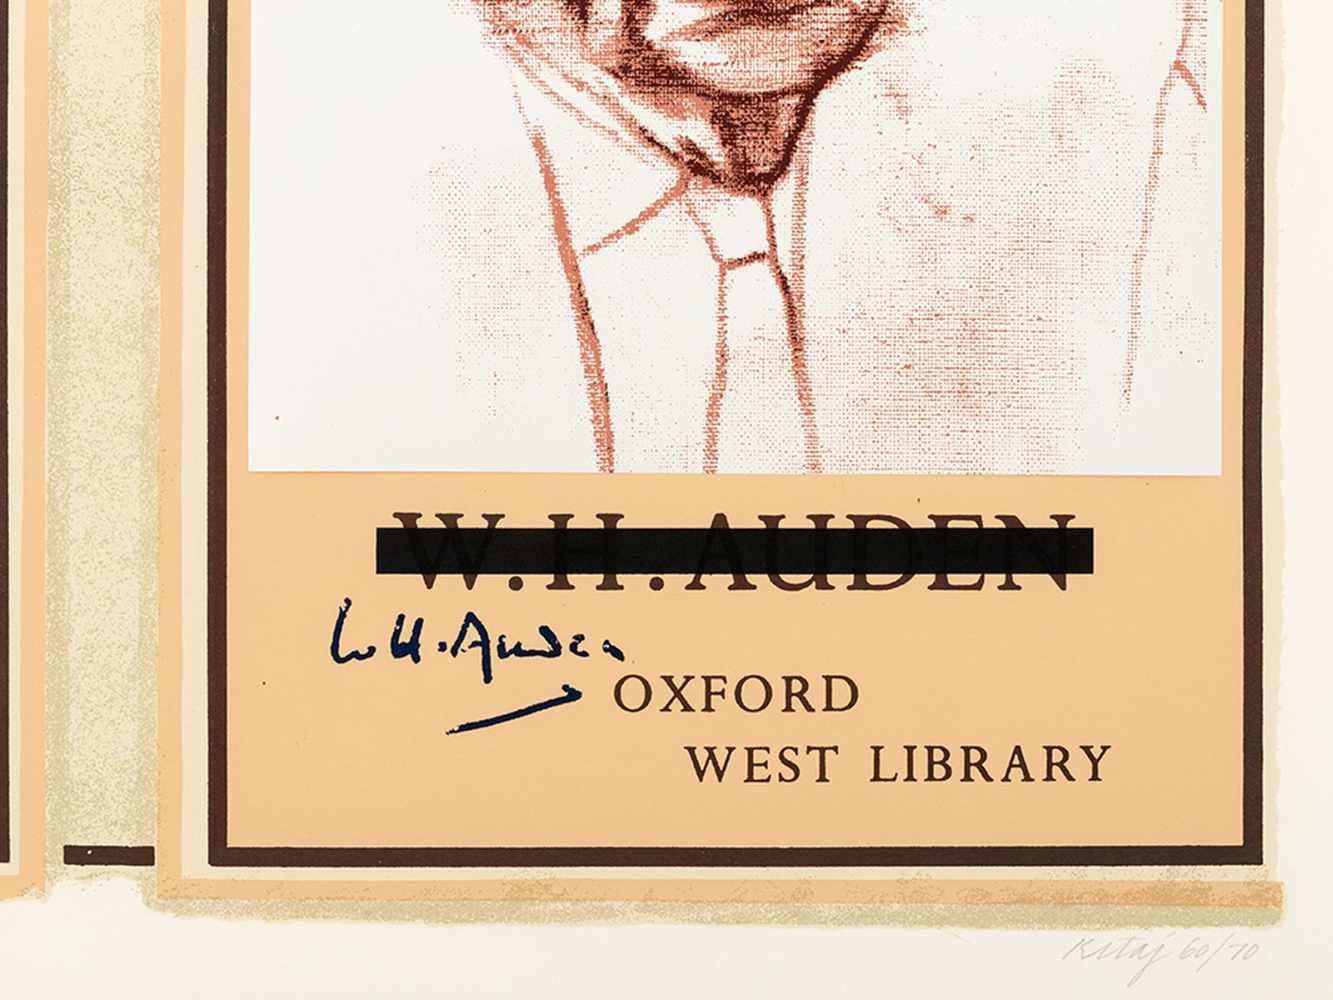 R.B. Kitaj (1887-1948), W.H. Auden, Color Serigraph, 1969 - Image 4 of 10